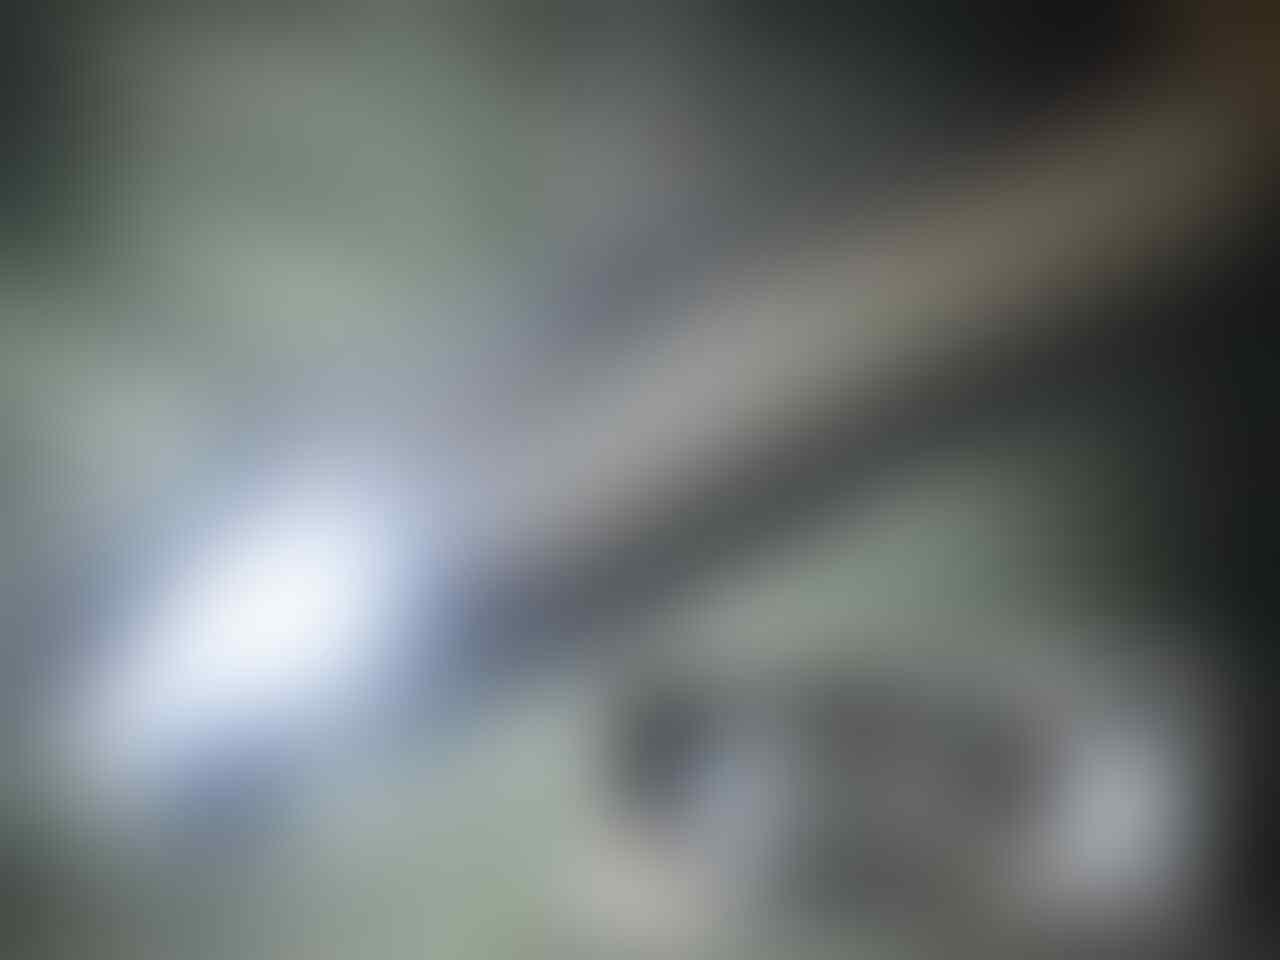 Terjual knalpot standart racing Satria FU 150 murah bet